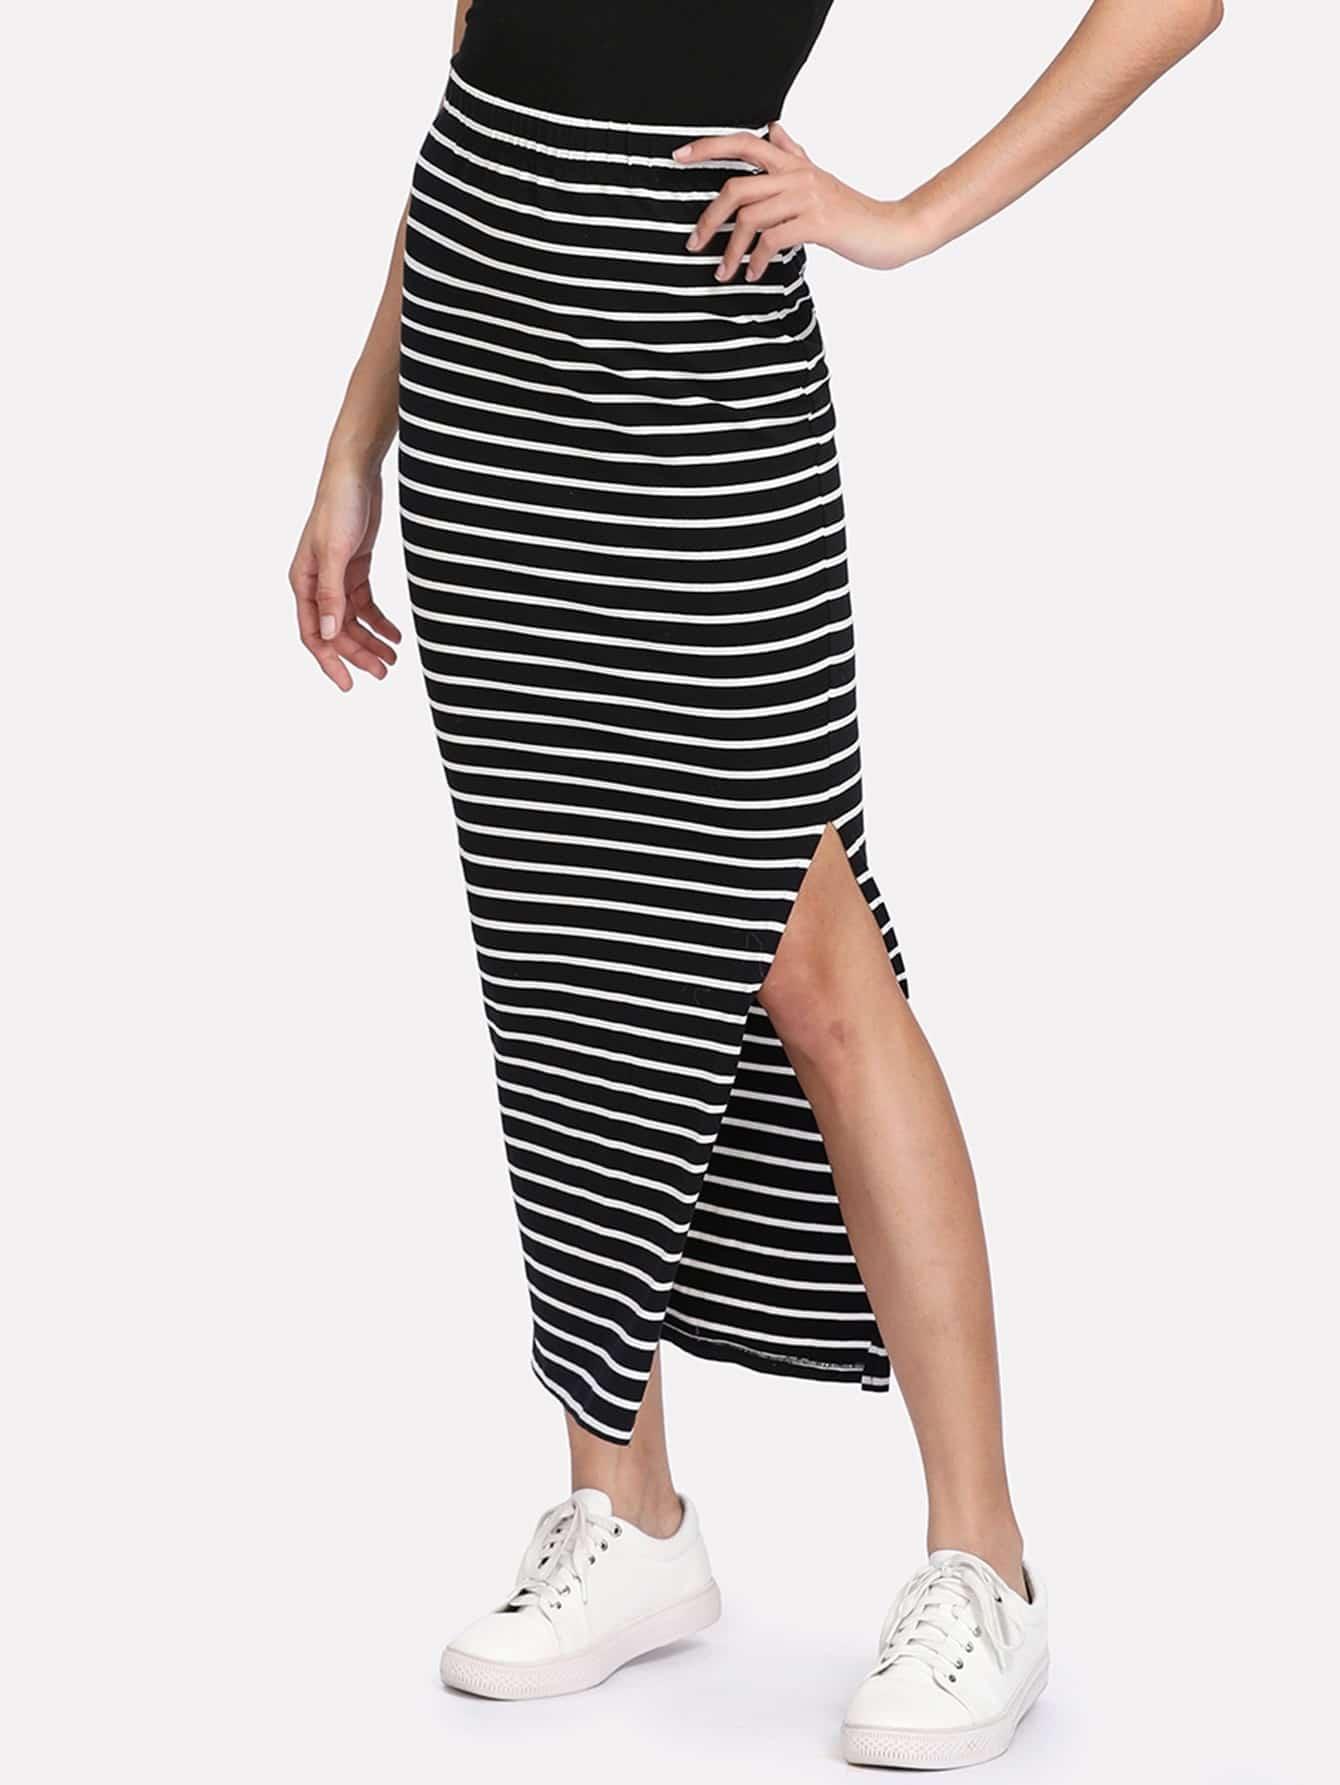 Slit Side Striped Skirt